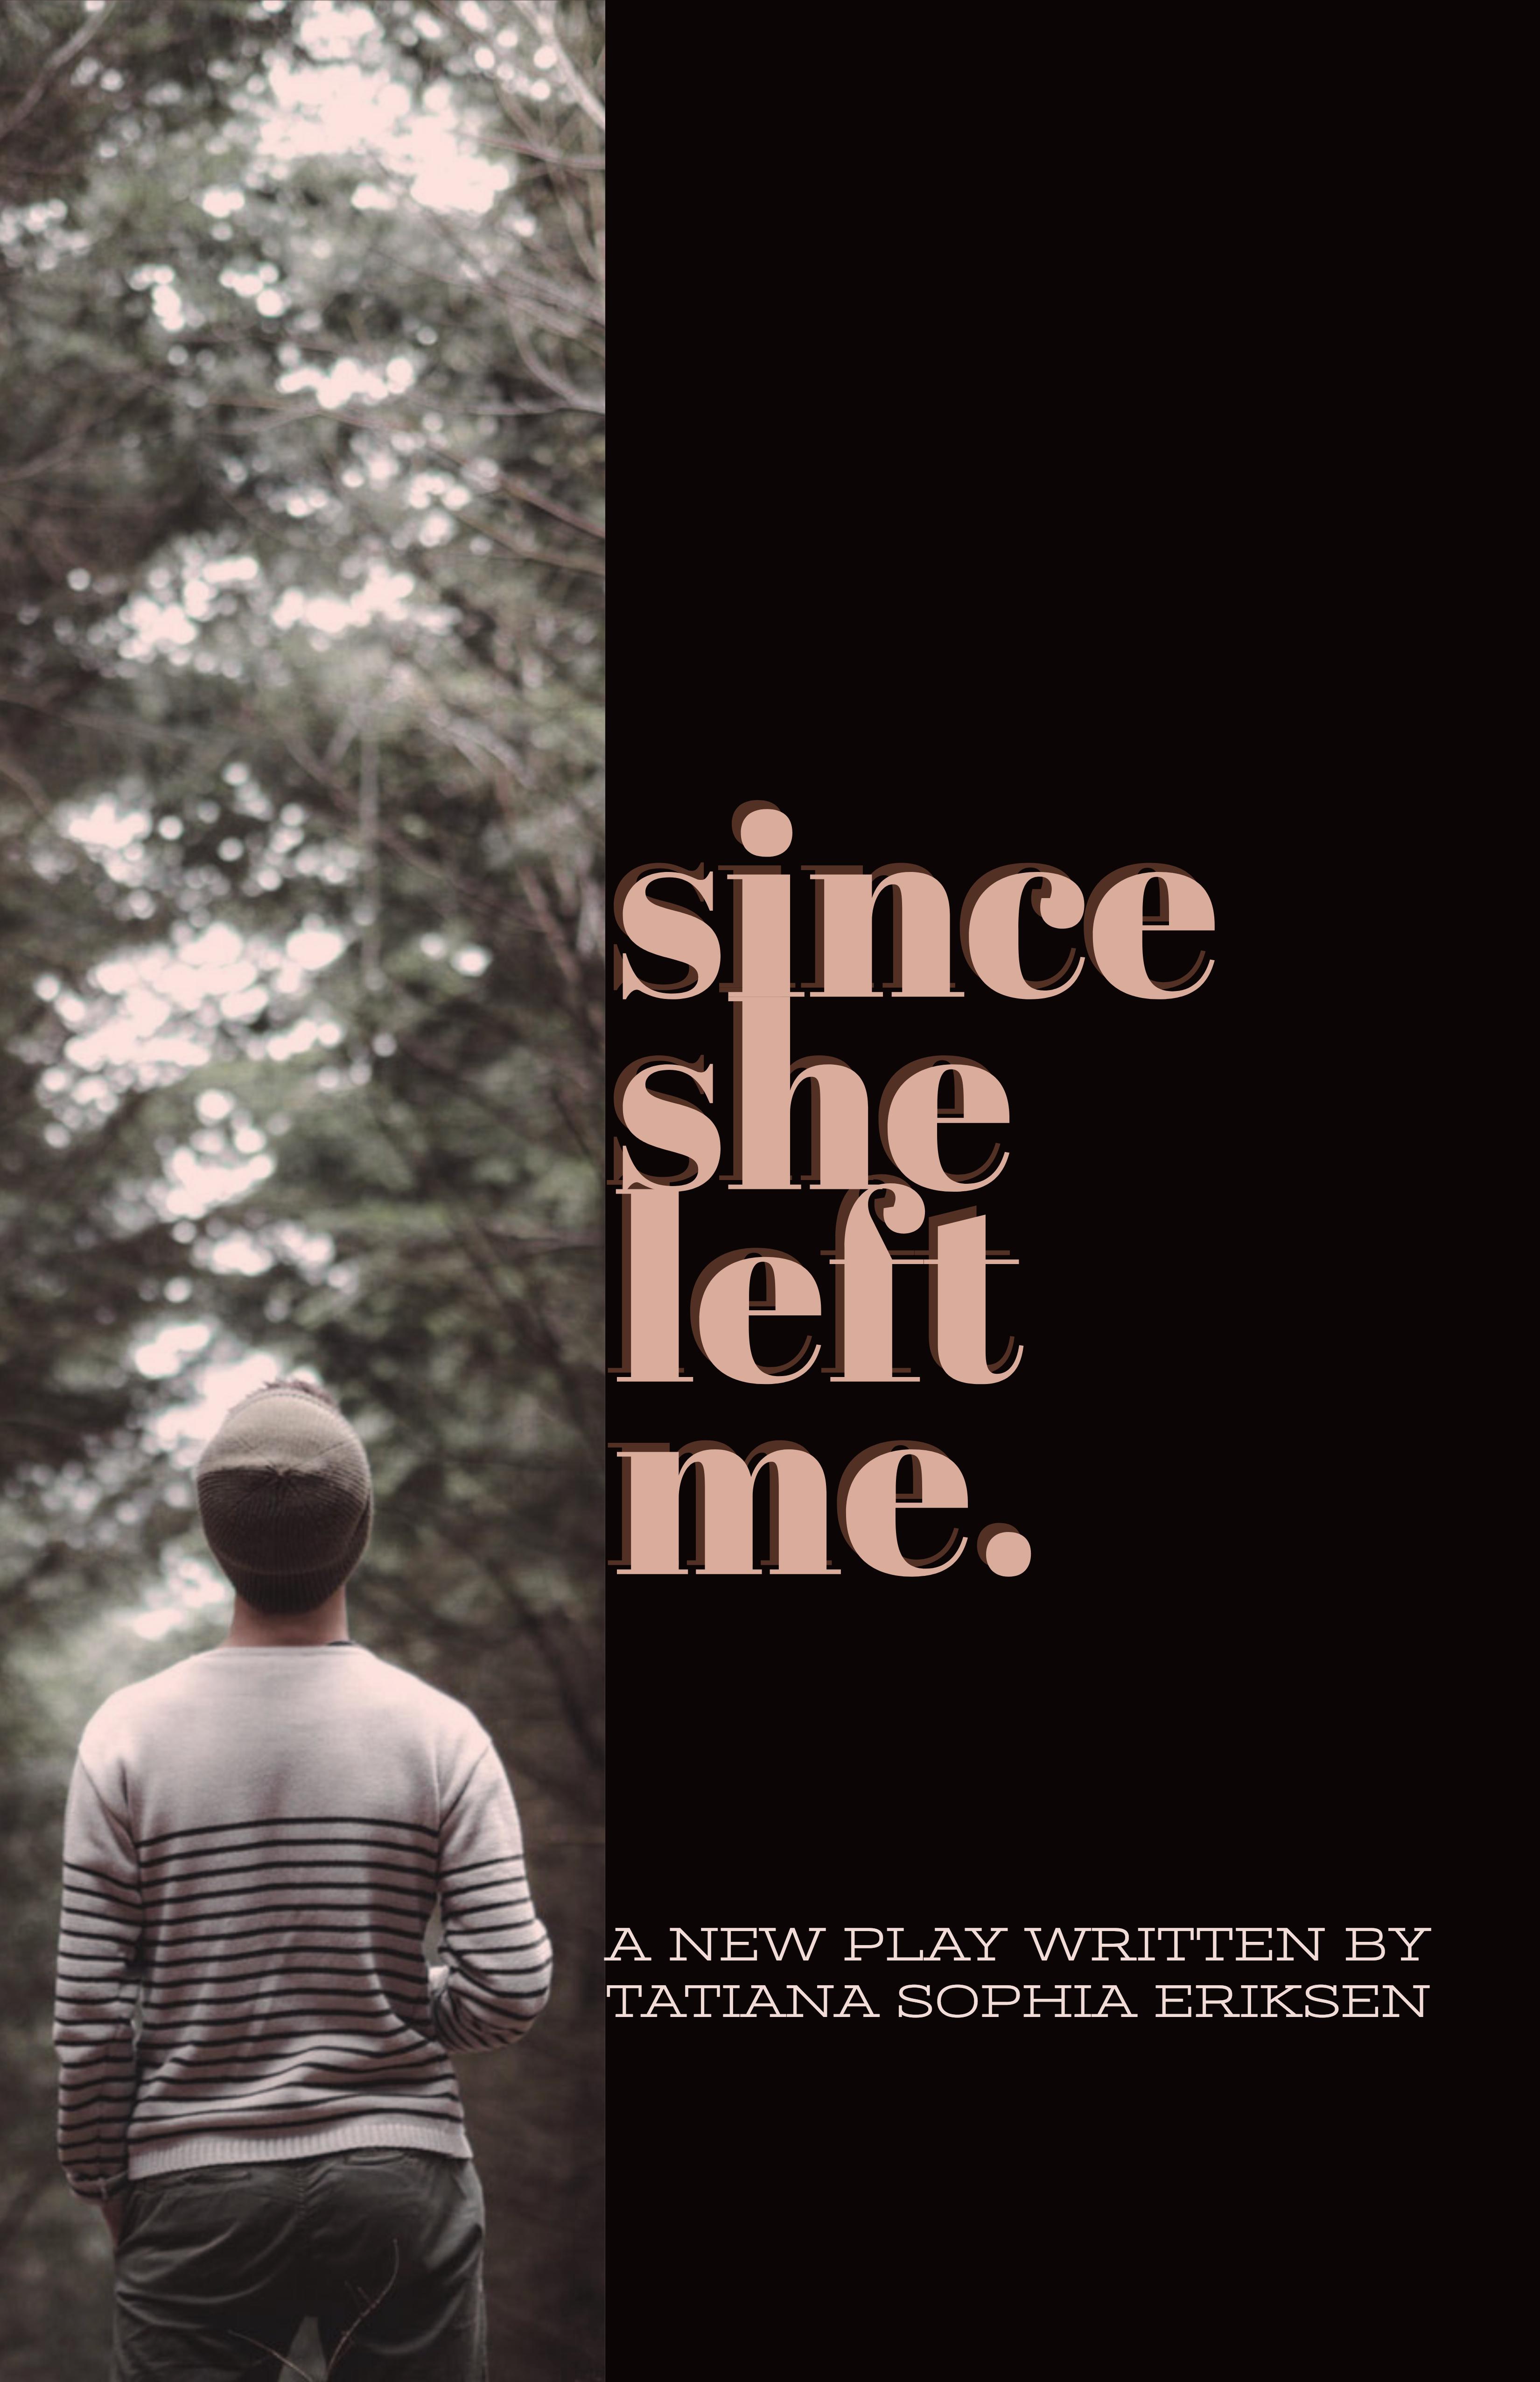 SINCE SHE LEFT ME - New York Theater Festival